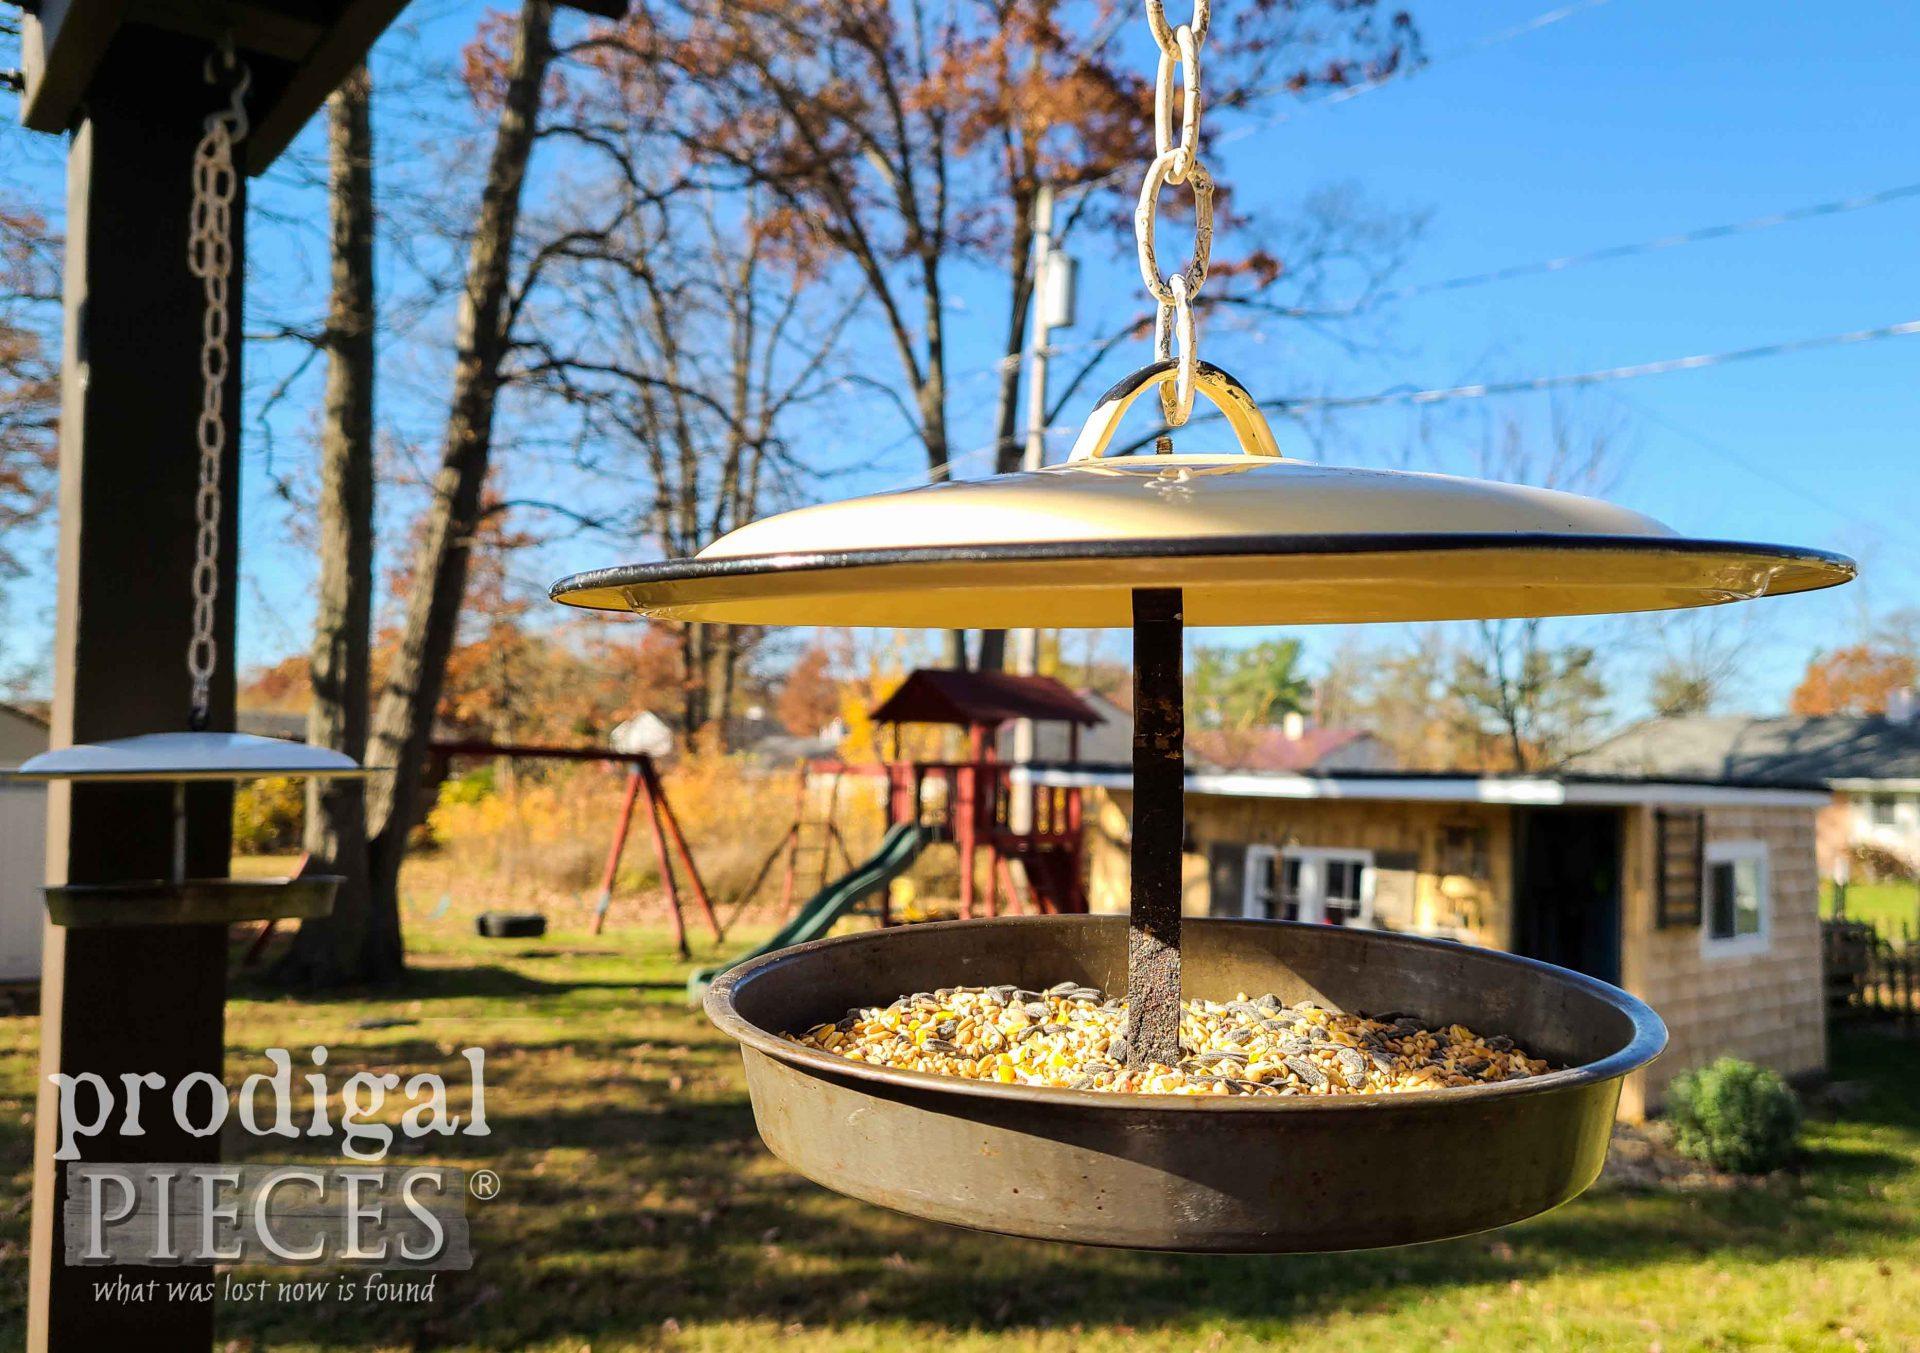 Handmade Enamel Pot Lid Upcycled Bird Feeder by Larissa of Prodigal Pieces | prodigalpieces.com #prodigalpieces #upcycled #handmade #garden #farmhouse #home #homedecor